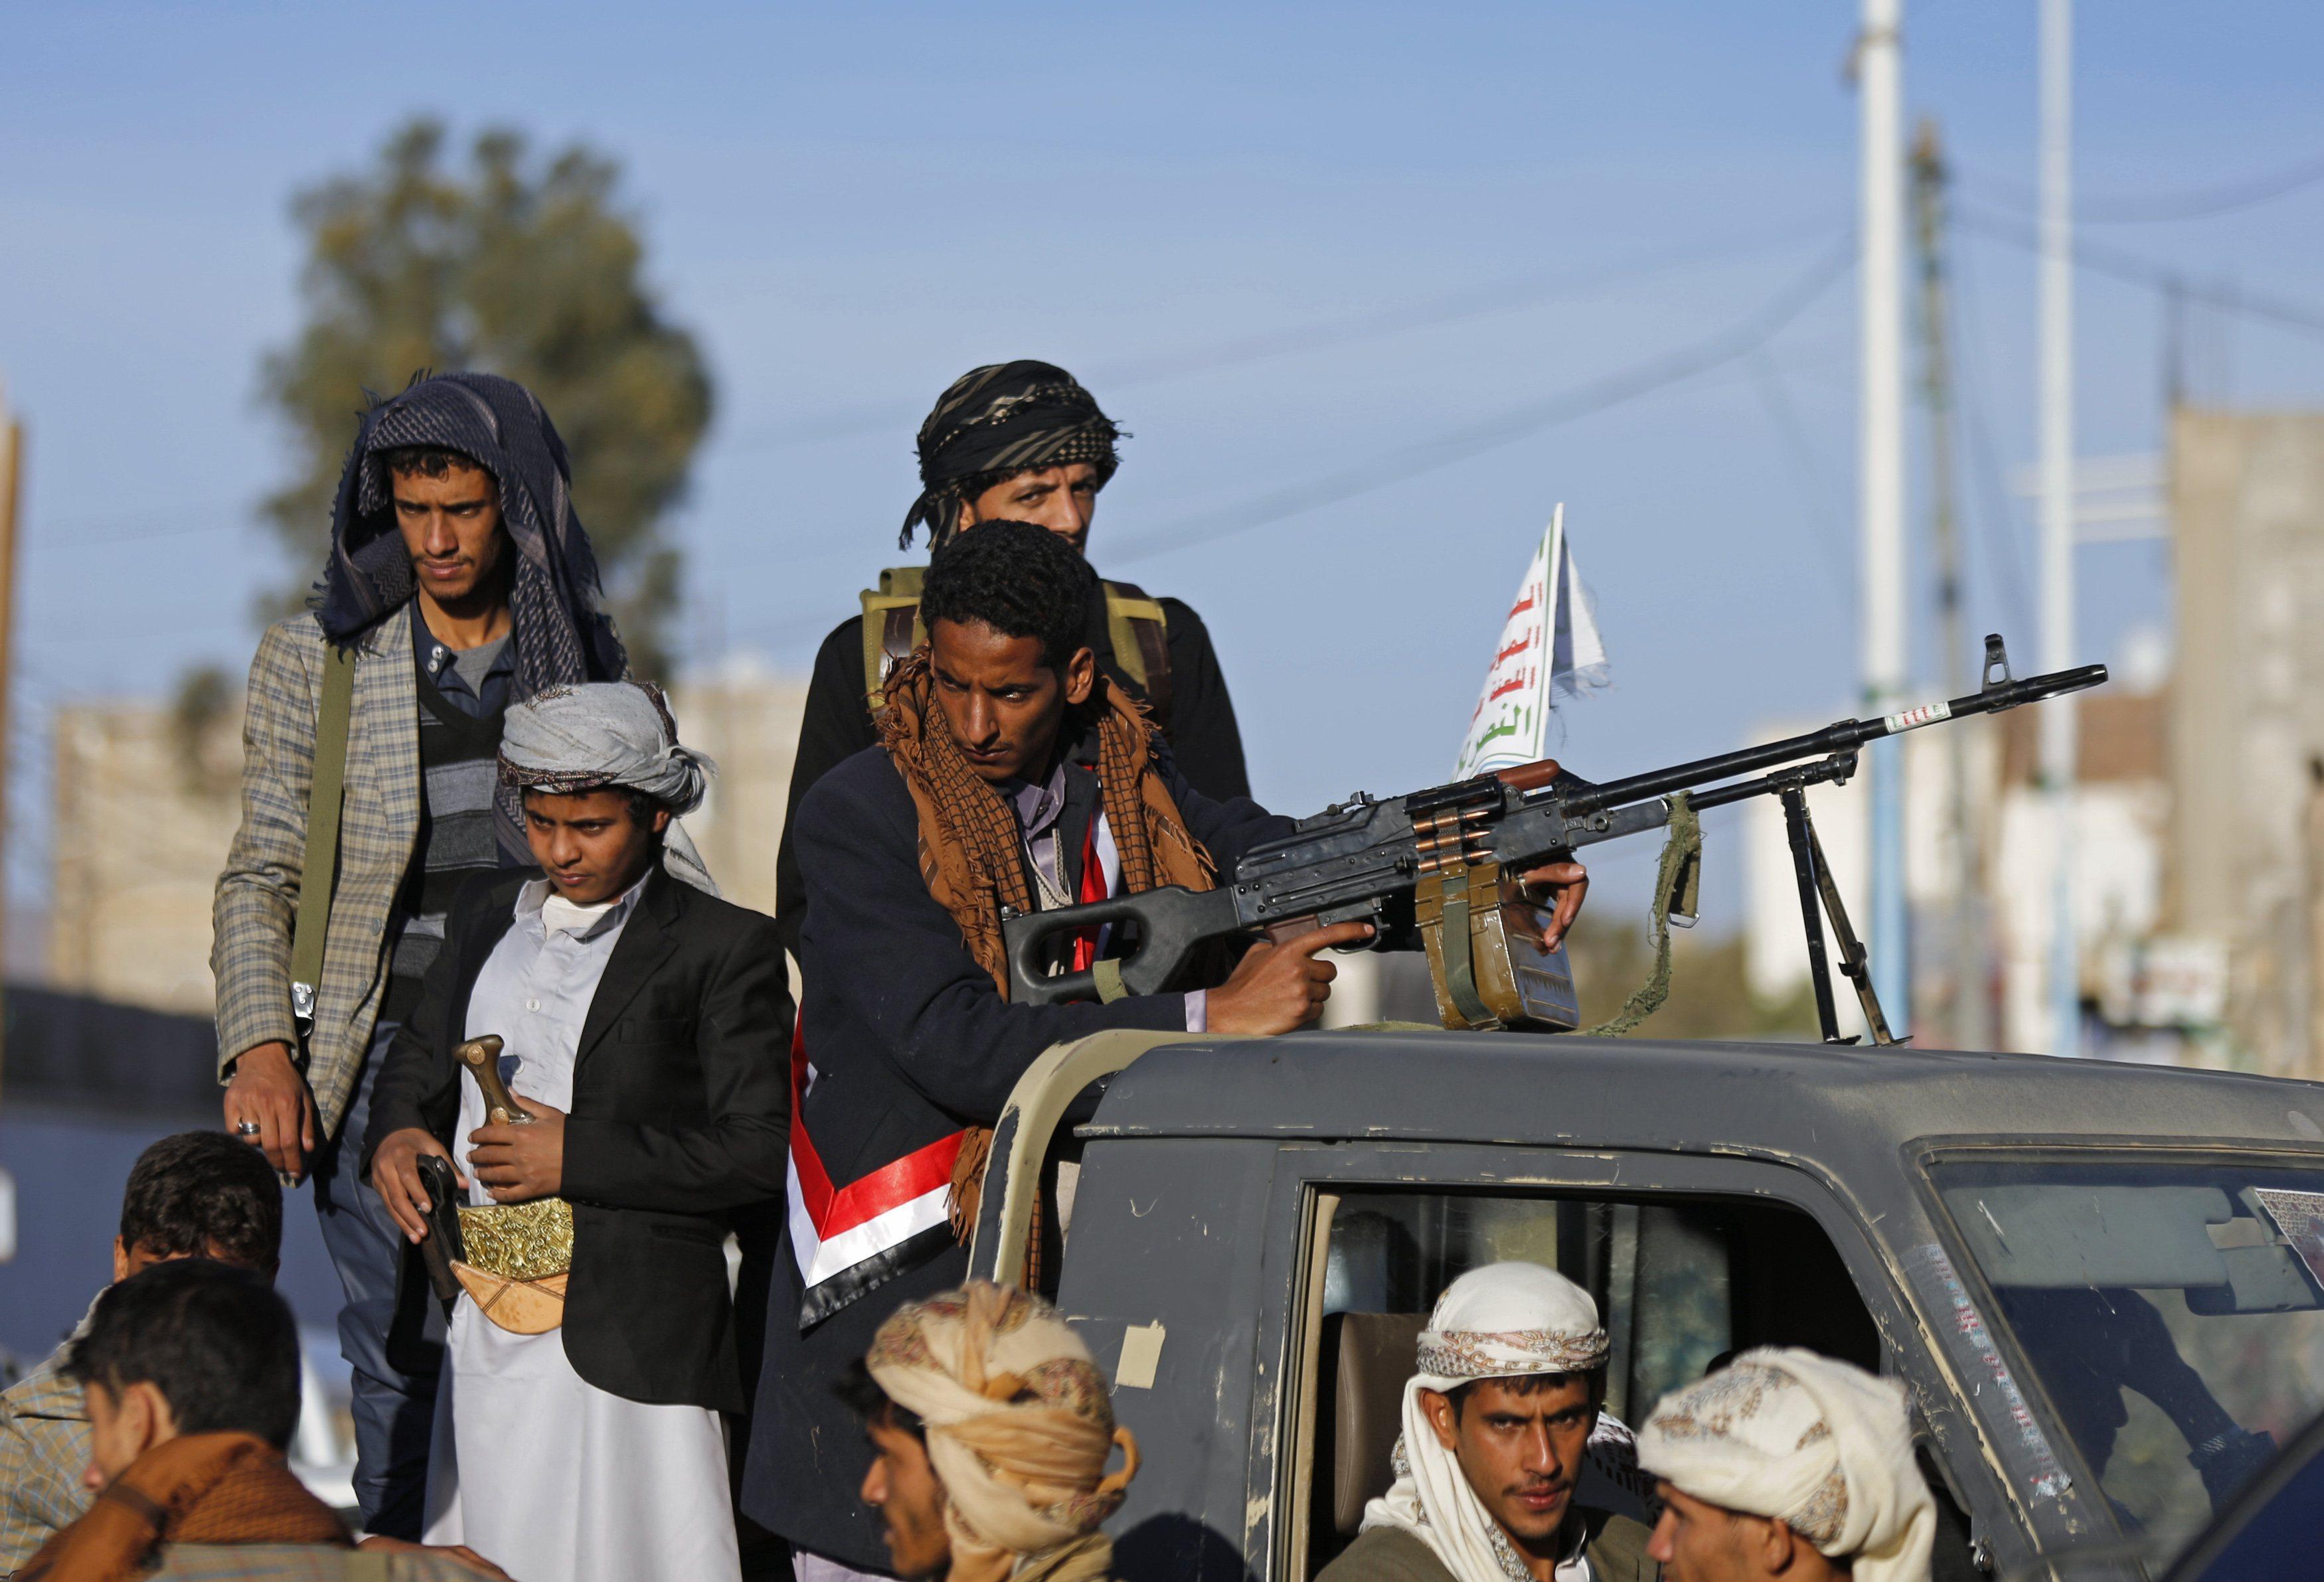 Photo of صدامات مسلحة بين طرفي الانقلاب في الحديدة ..والحوثيون يعتقلون ضباطا موالين للمخلوع